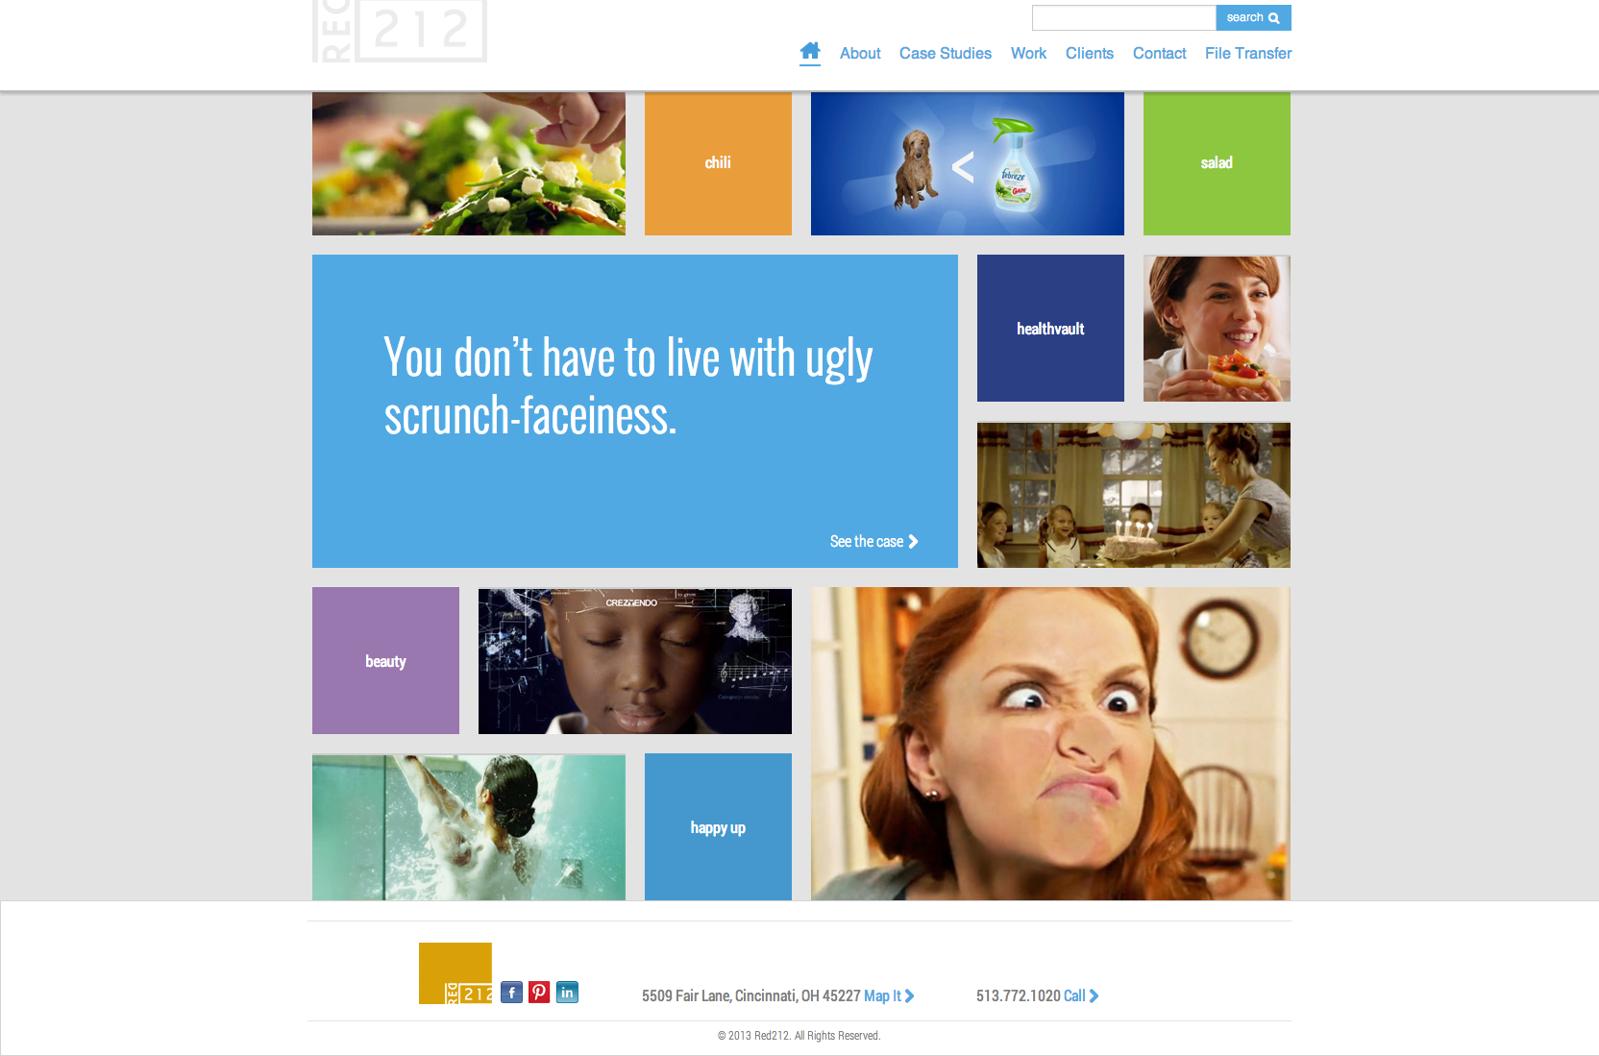 Red212.com homepage